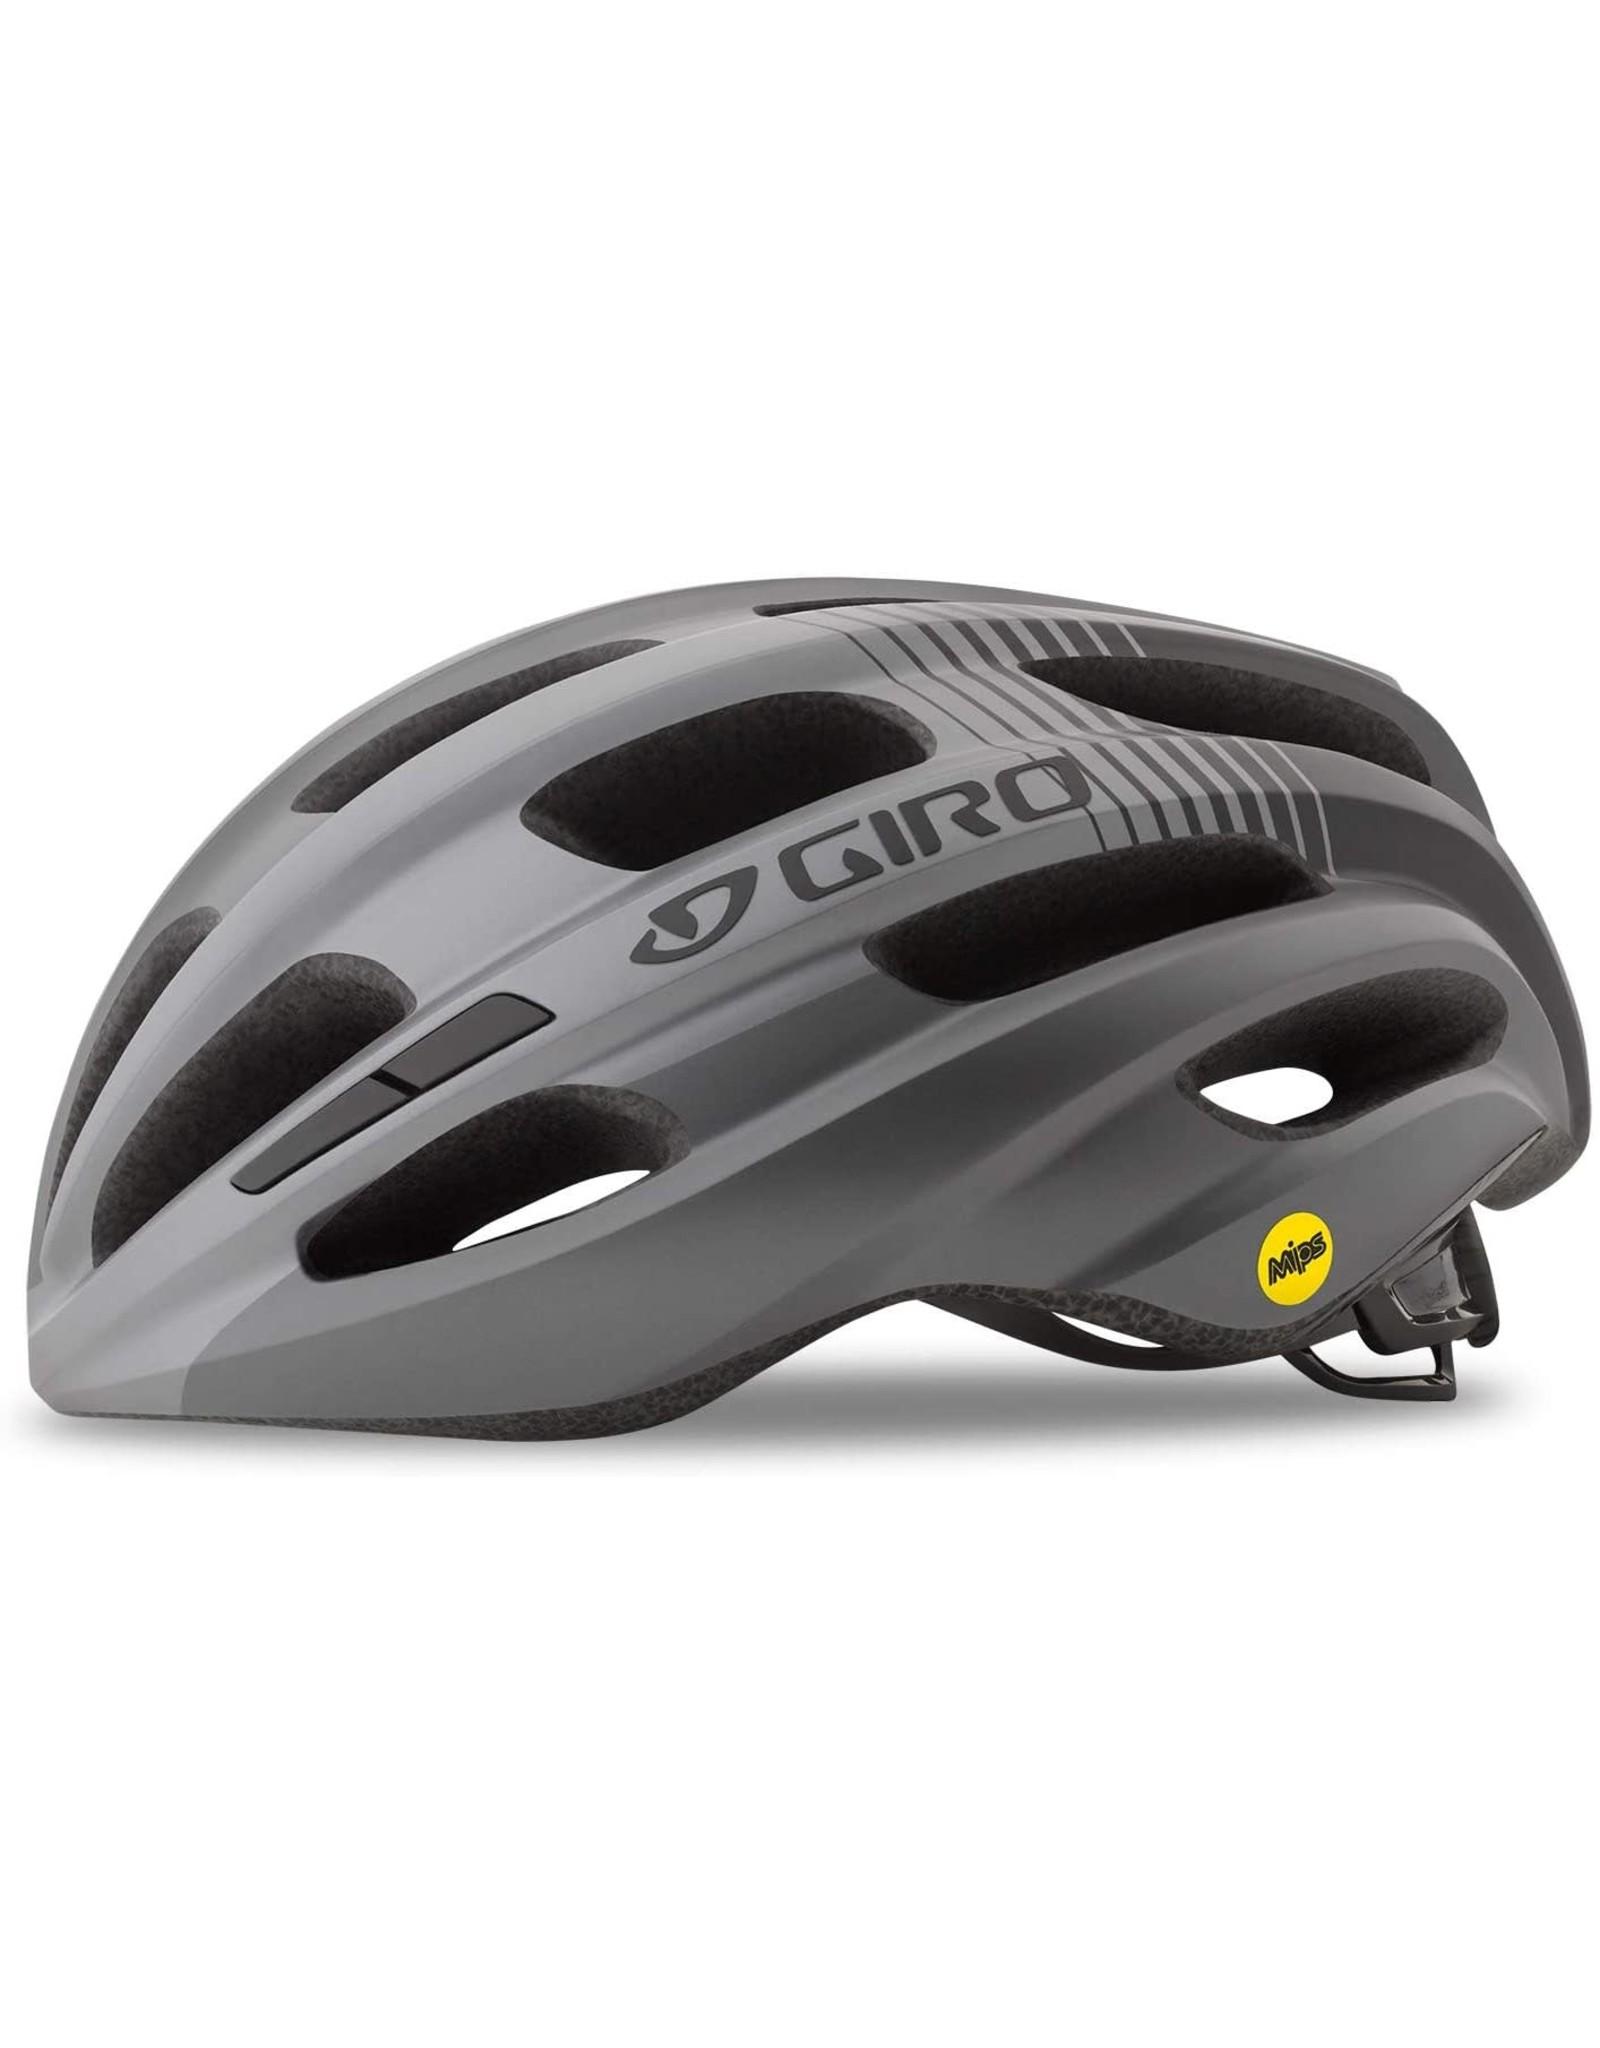 Giro '20, GIRO, Helmet, Isode MIPS